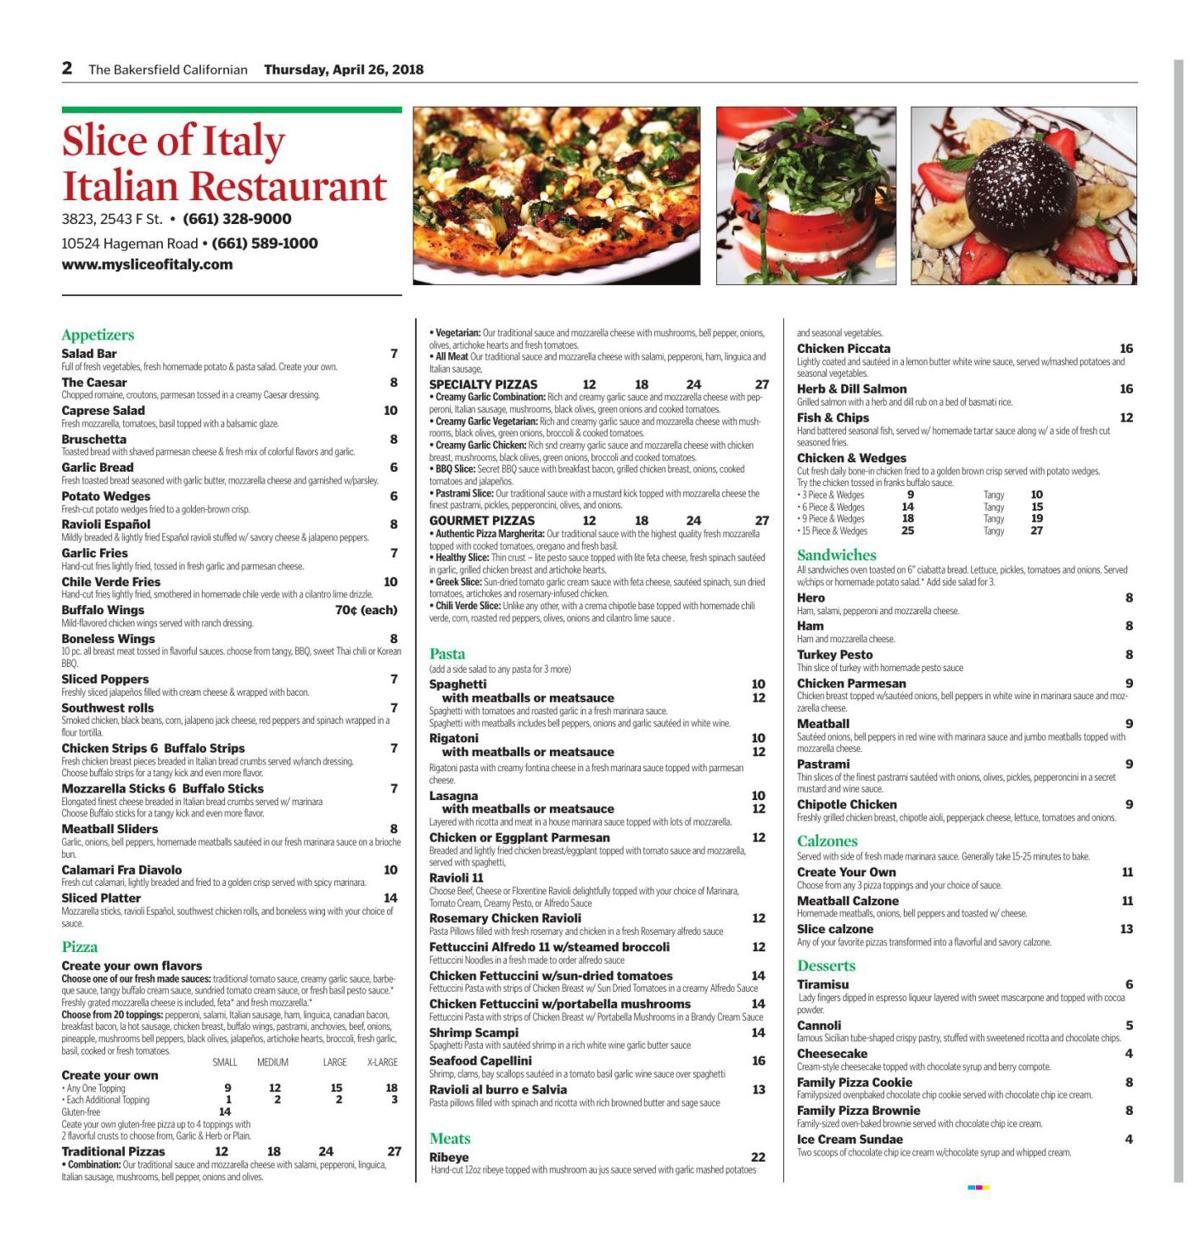 Slice of Italy Italian Restaurant